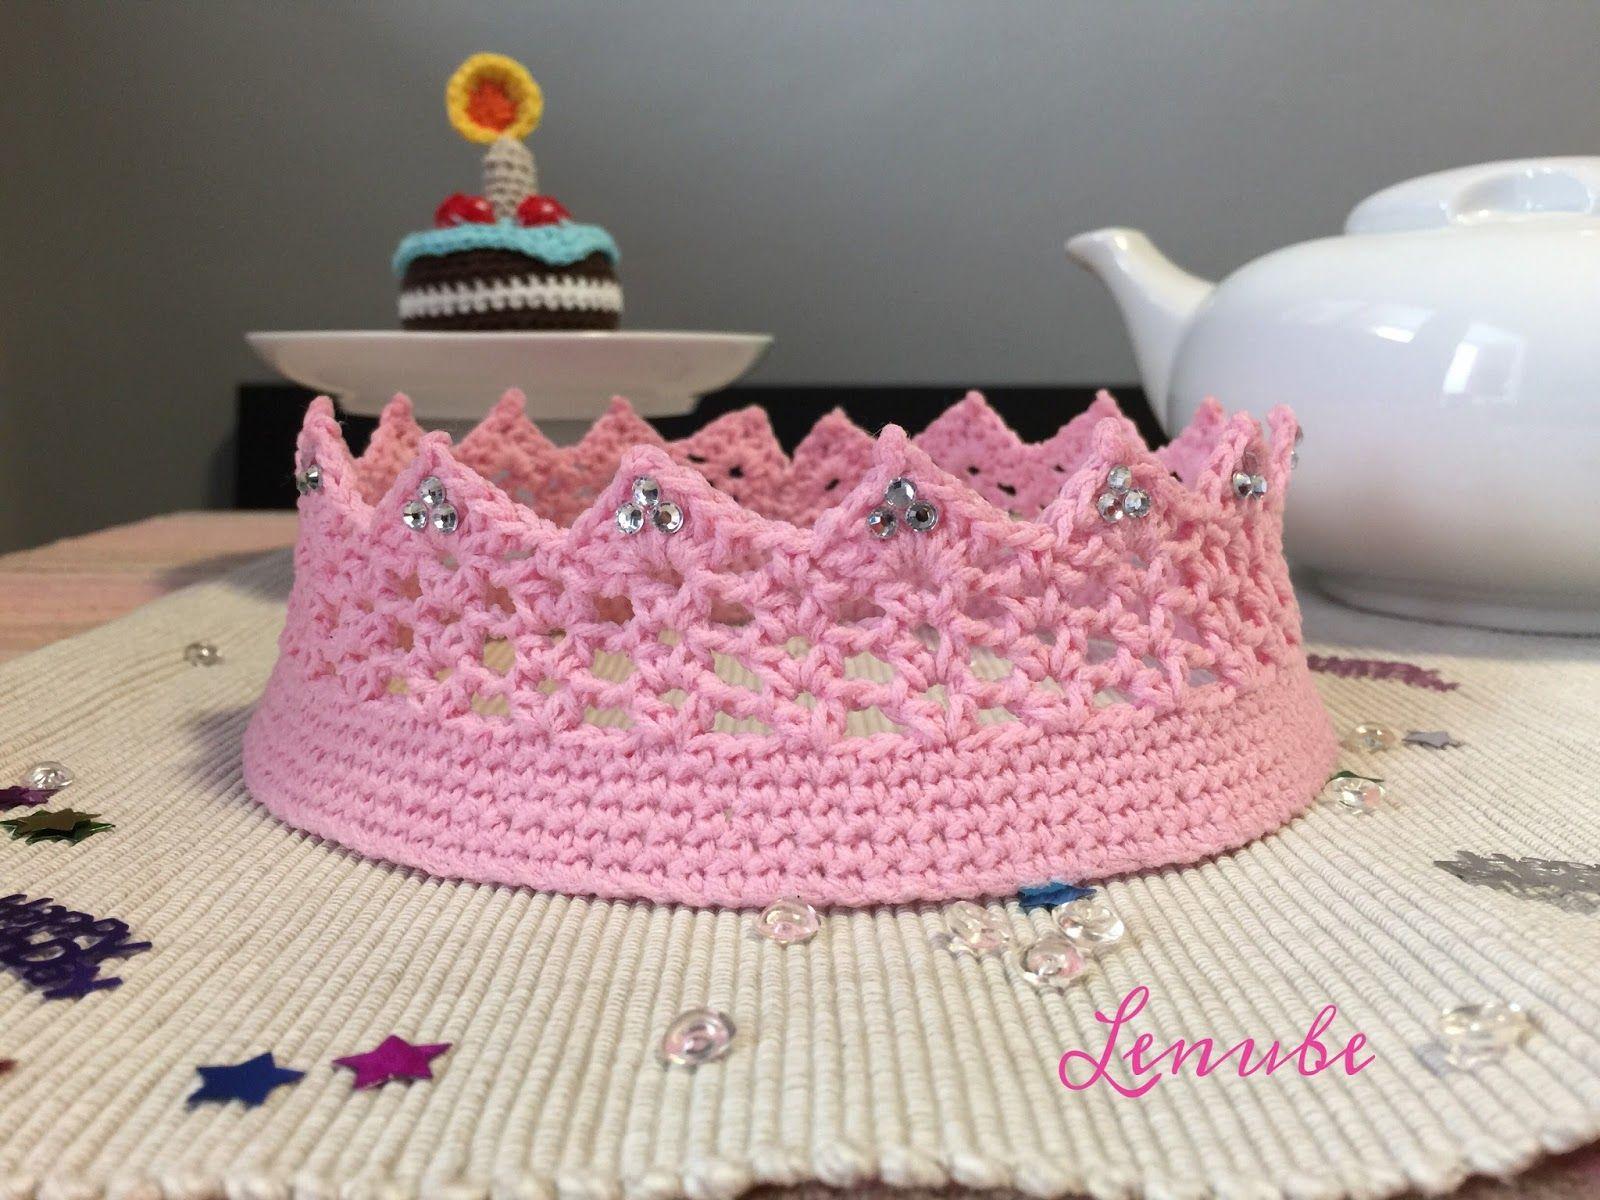 Ideas Cumpleaños a crohet. Reto Creativo | ganxet | Pinterest ...